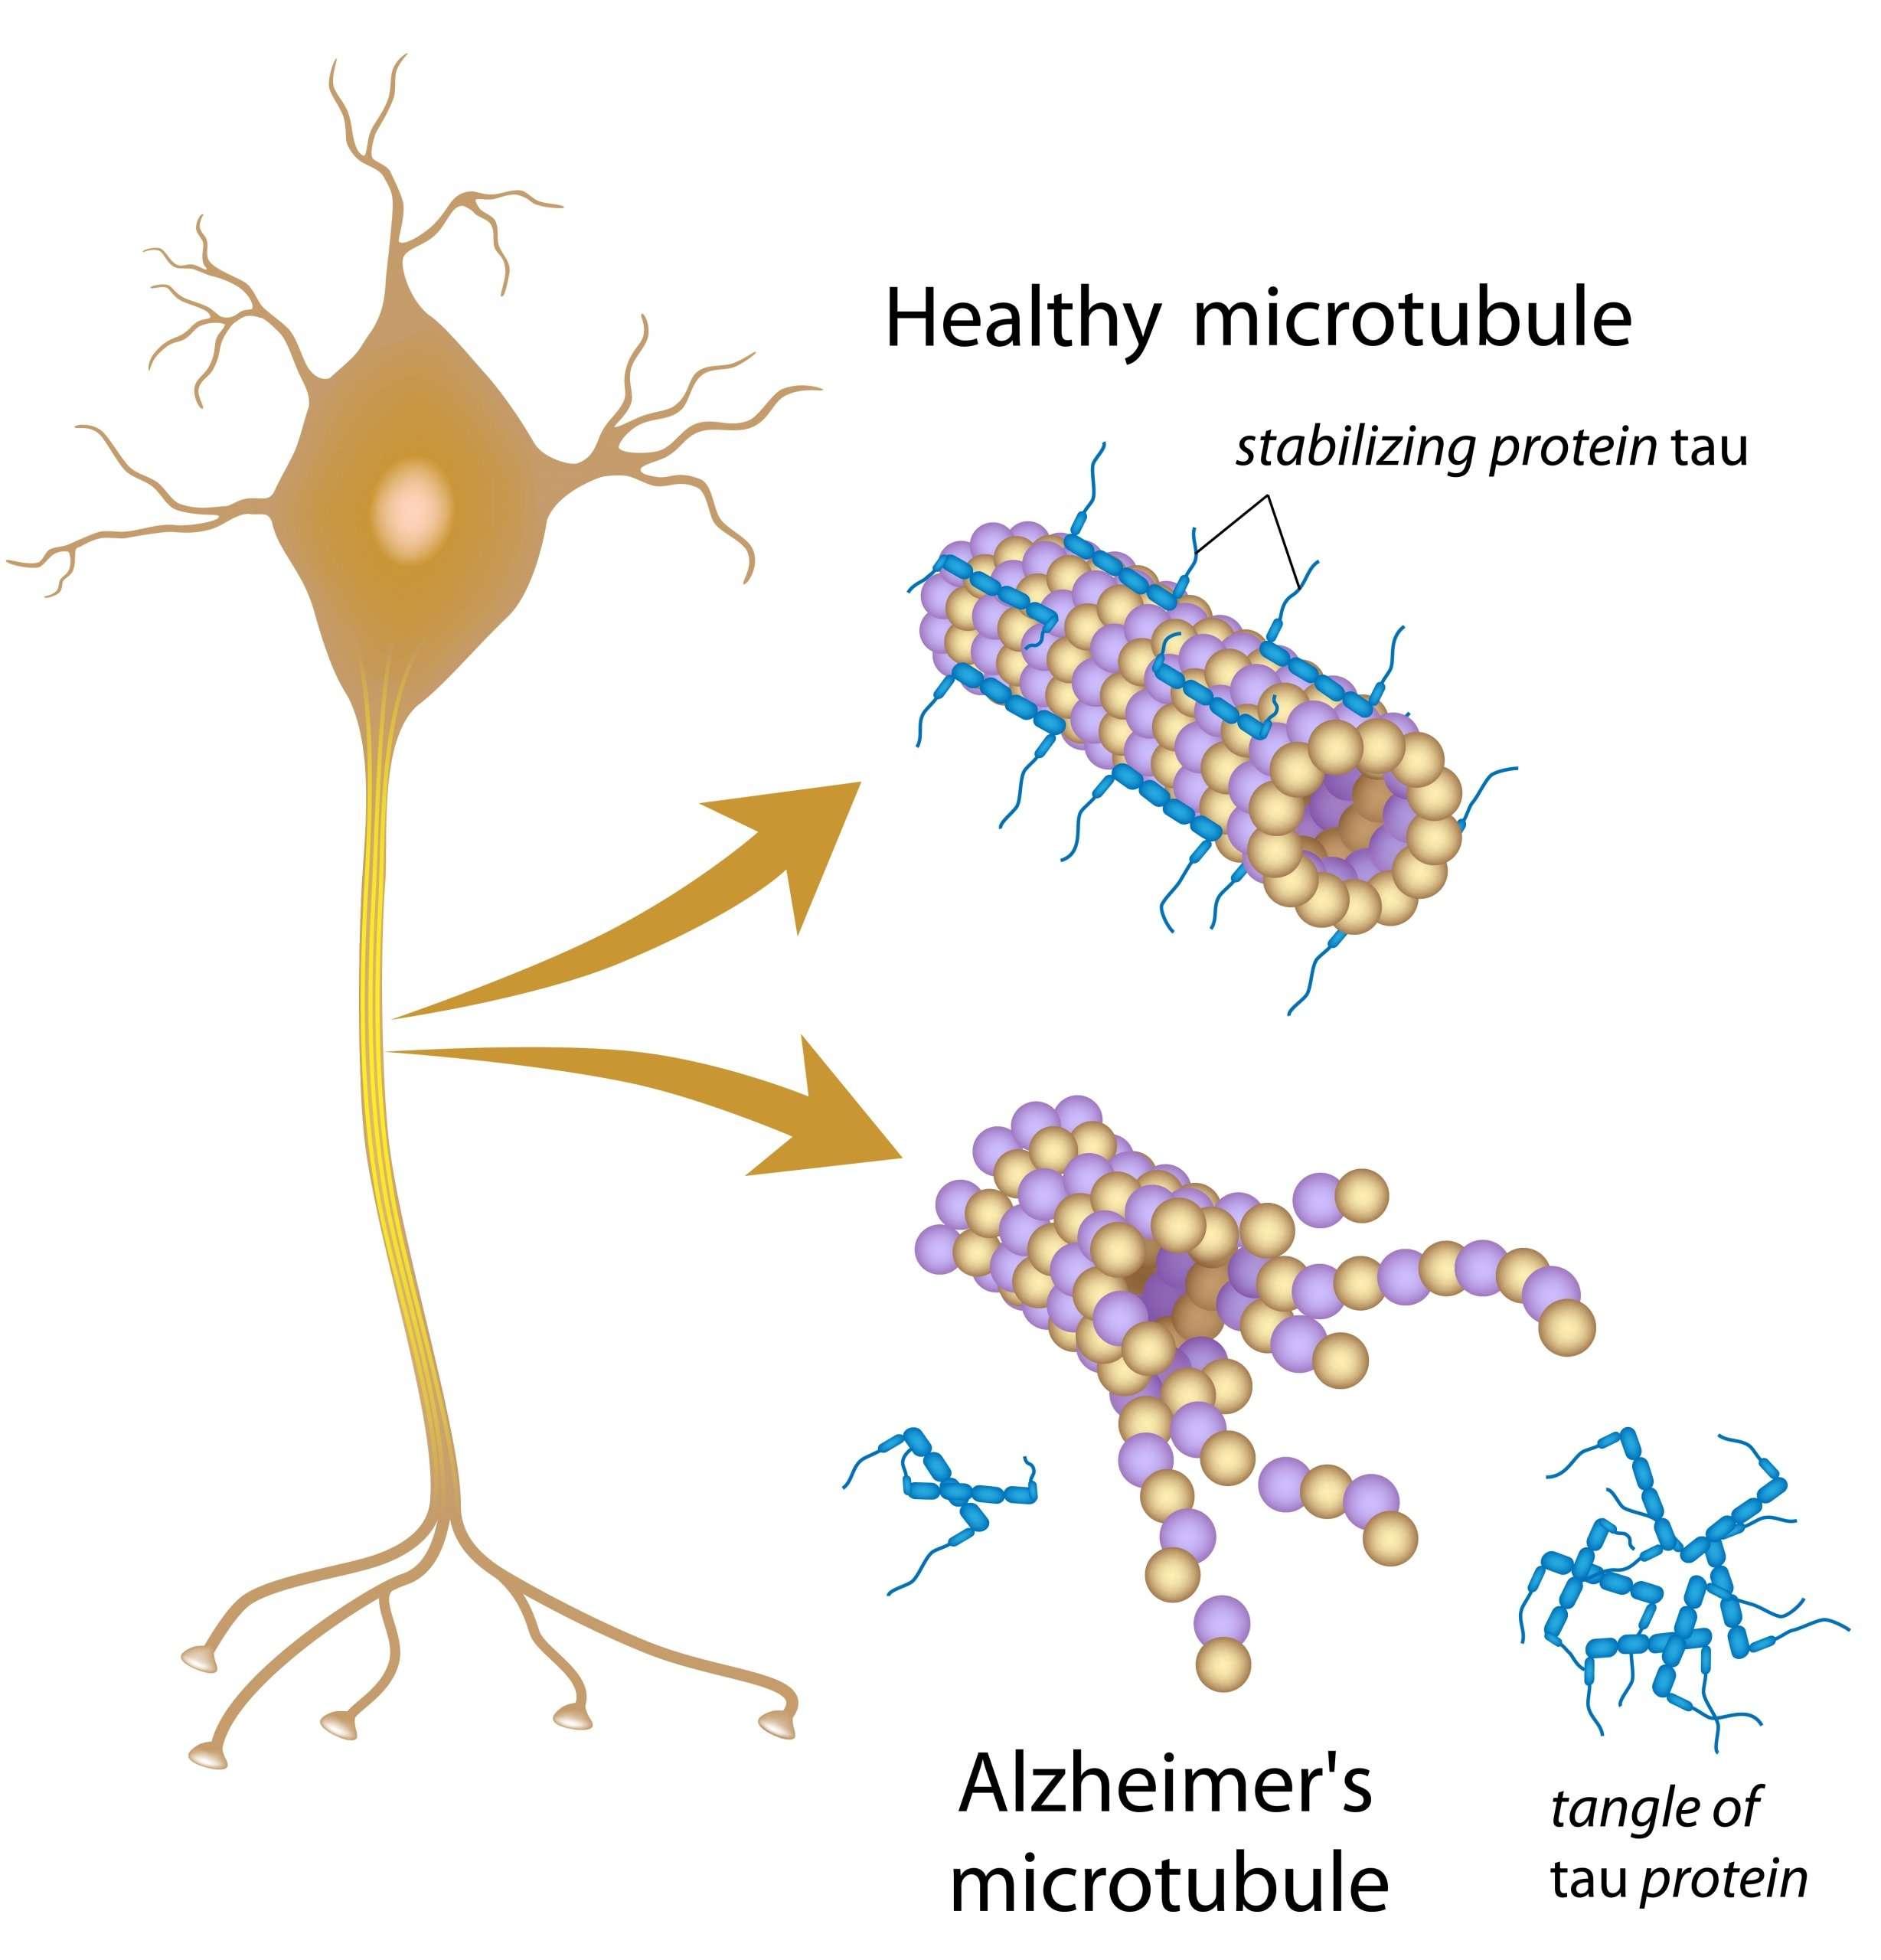 Alzheimer's microtubule